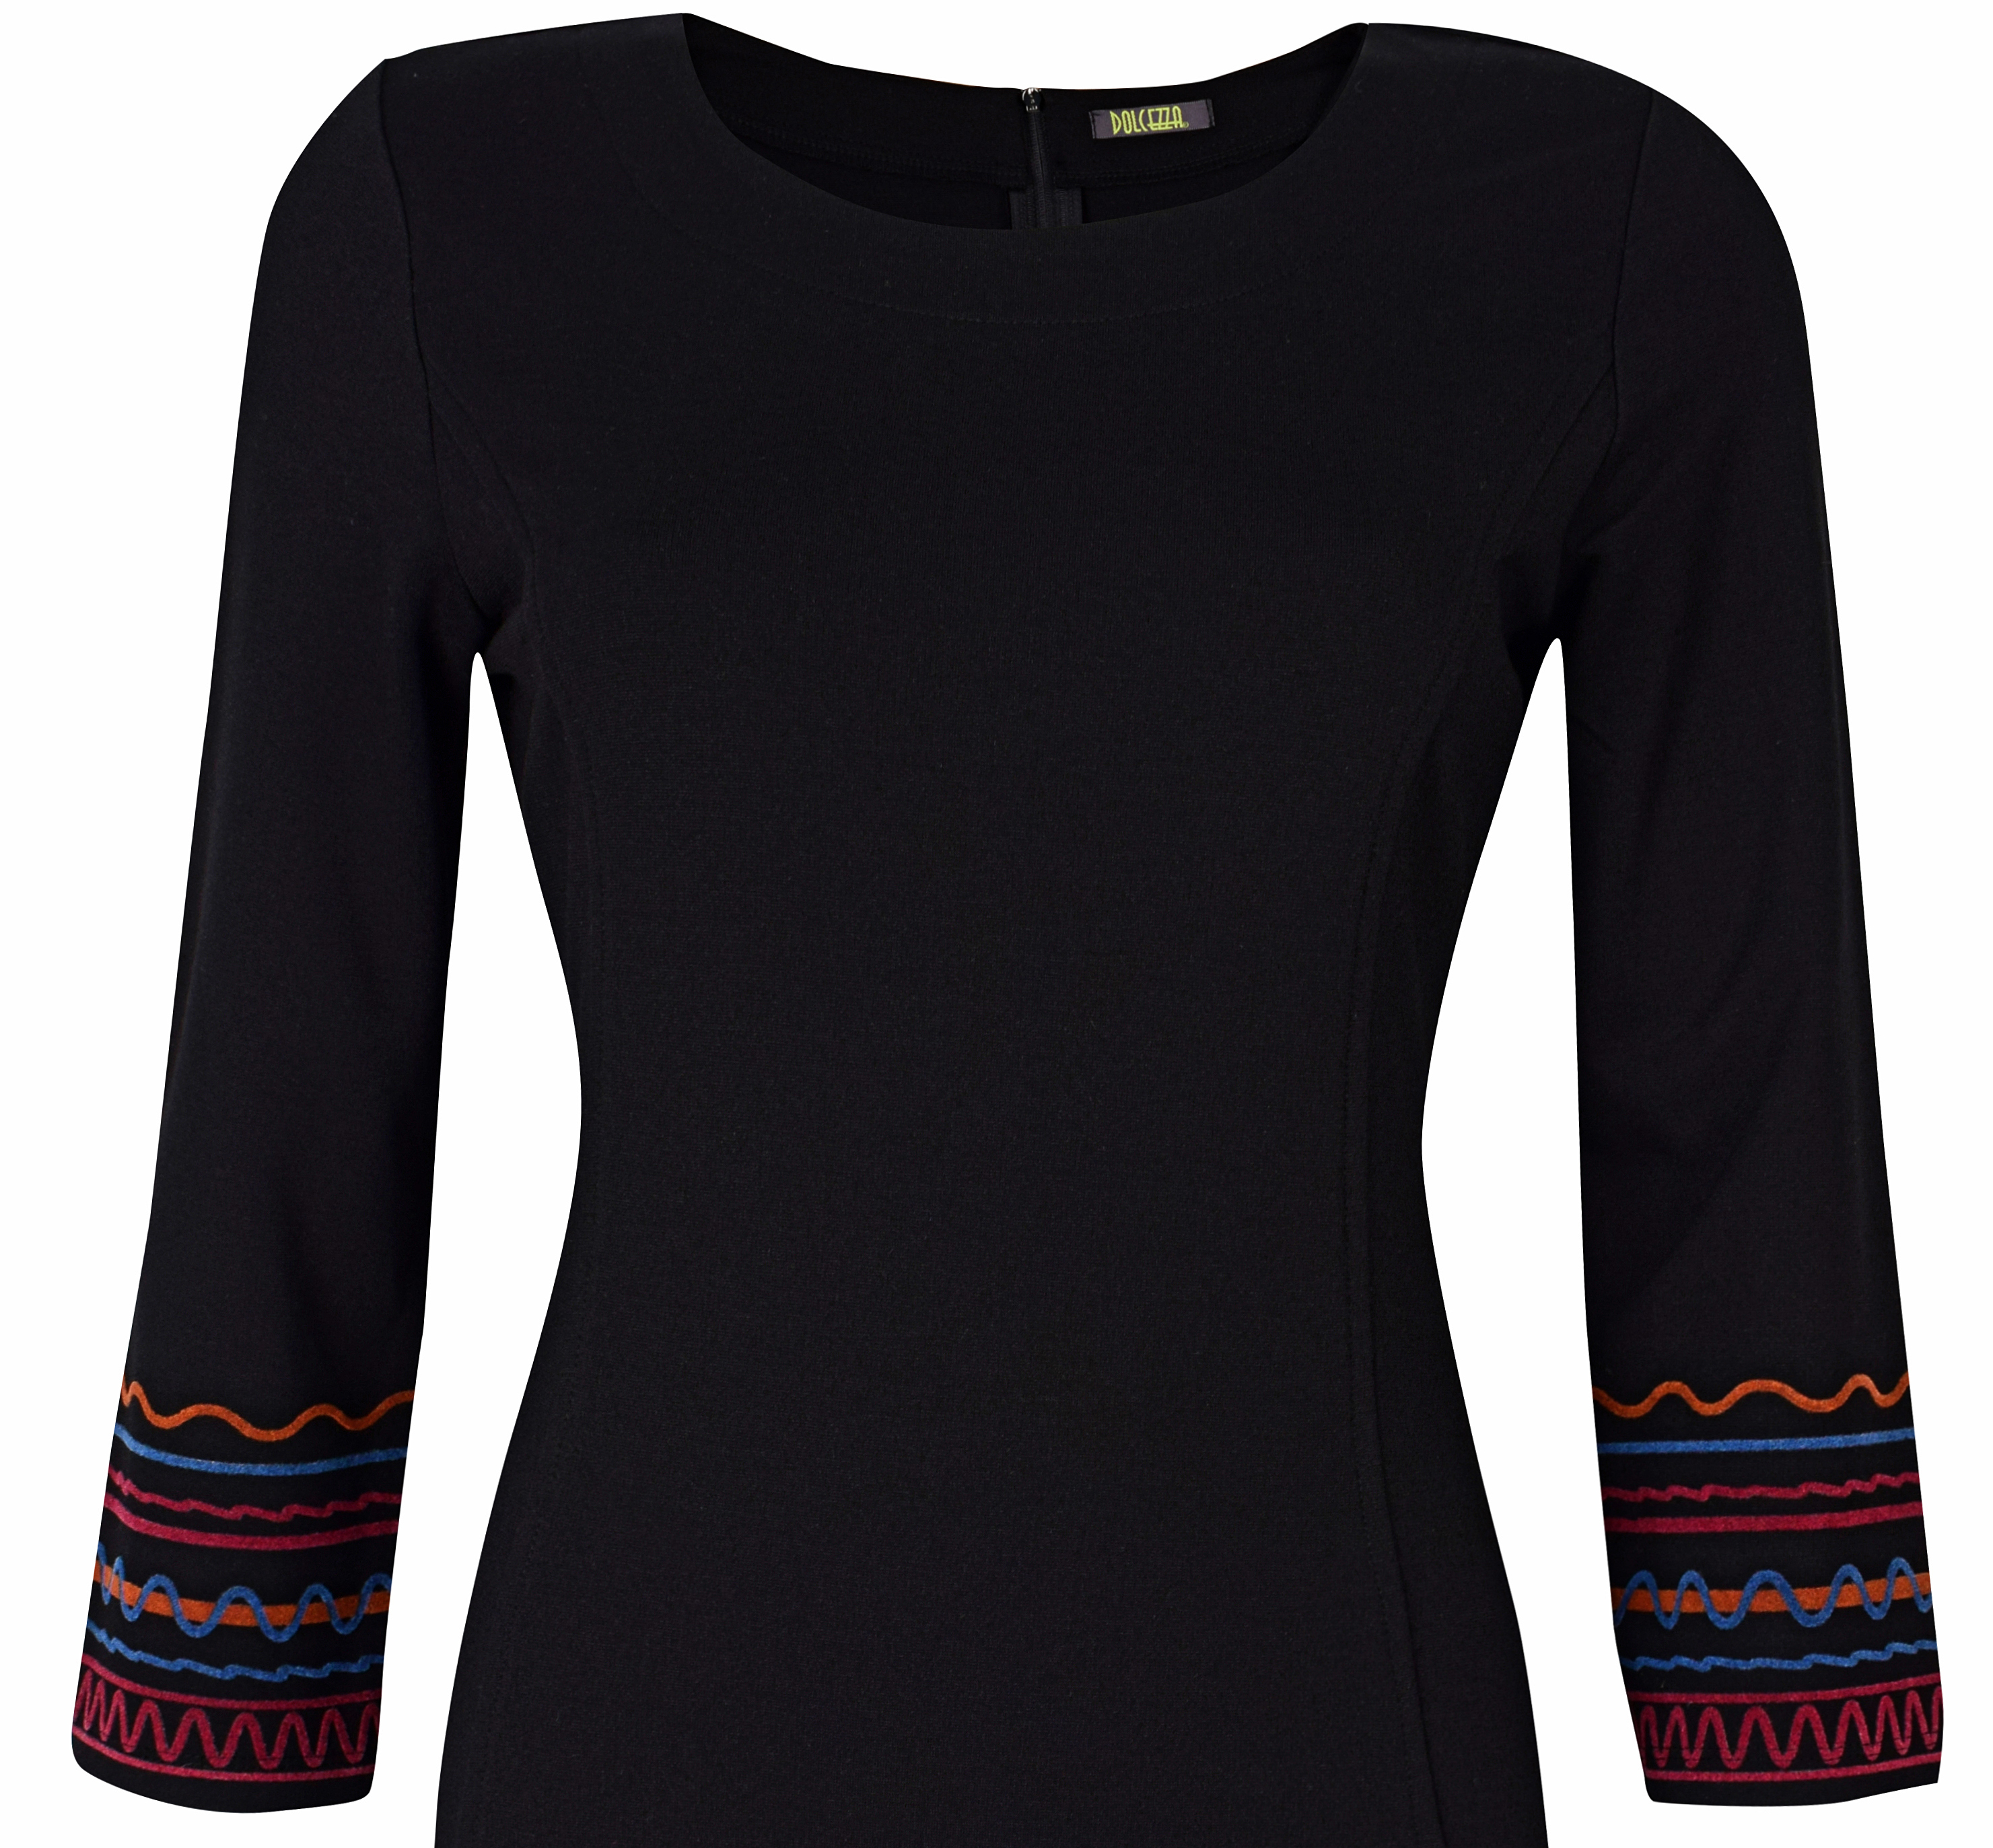 Dolcezza: Casablanca Rhythm Midi Back Zip Dress (2 Left!)